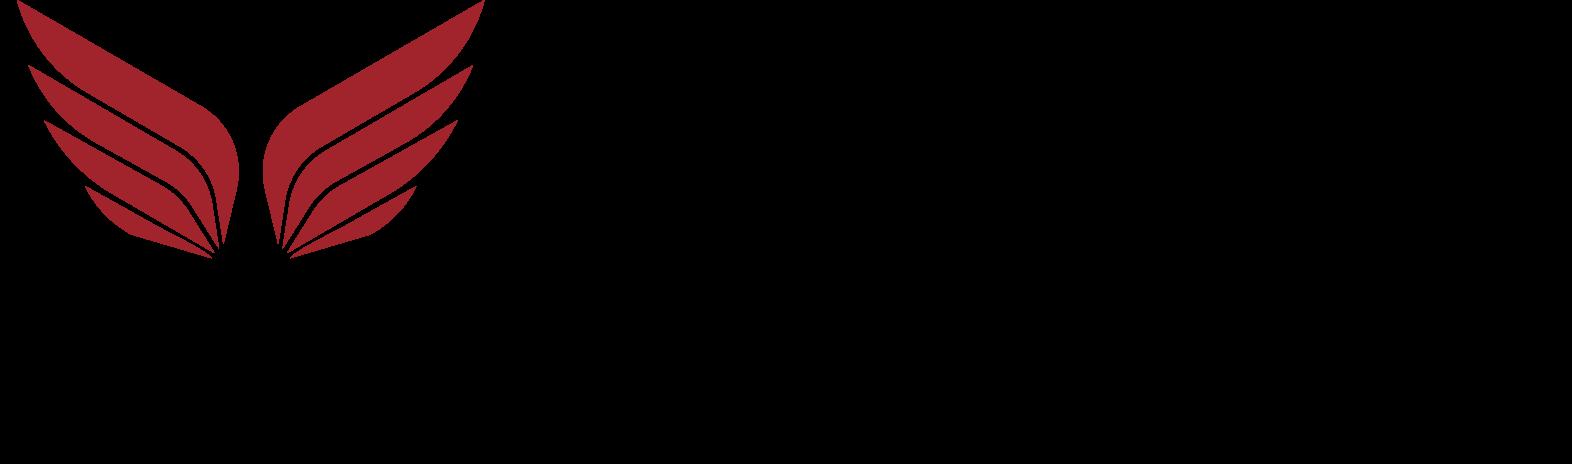 wings group Logo mit roten Flügeln über dem i